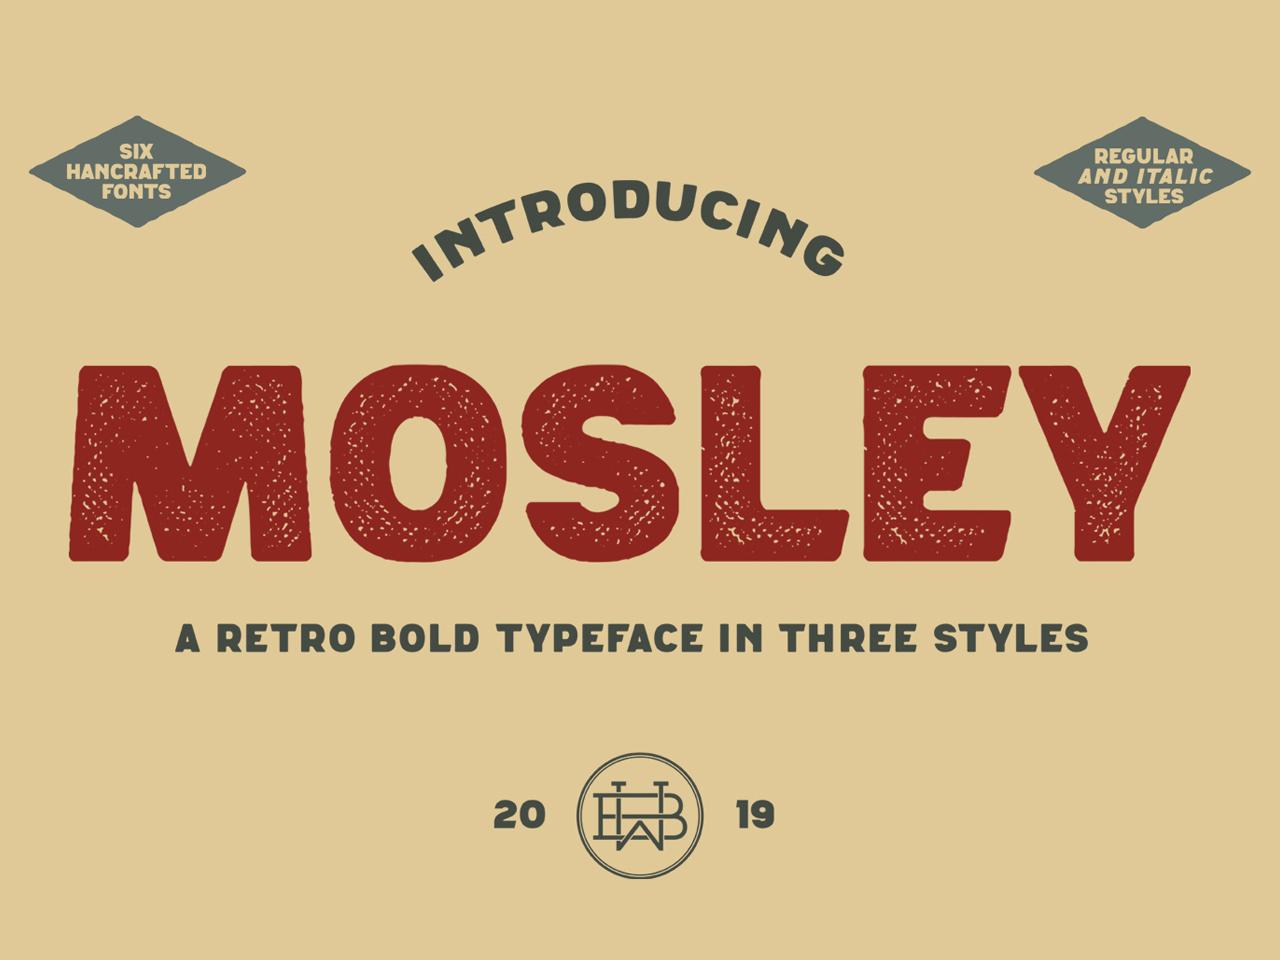 Mosley - a retro bold typeface sans display font label textured brand vinatge font logo font bold font type design type logo vintage display typeface font typography handcrafted retro